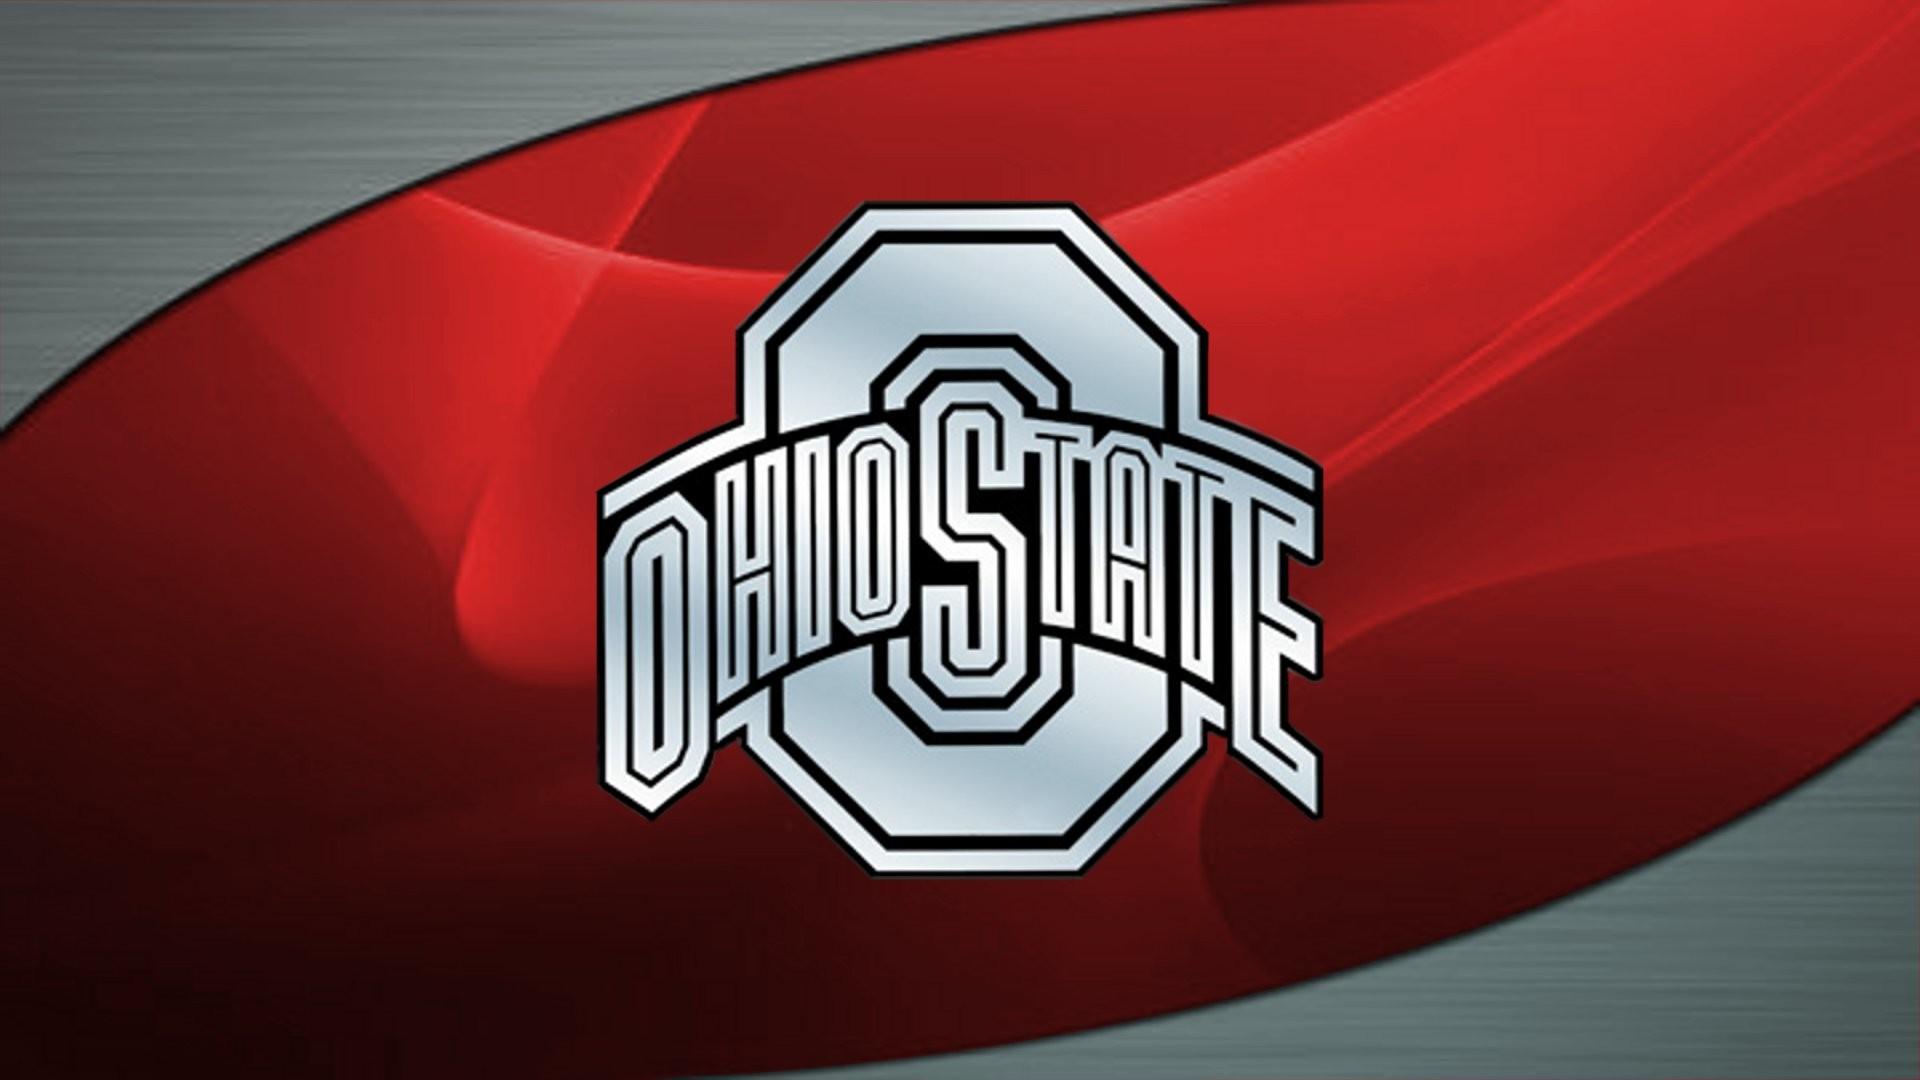 OSU Wallpaper 45 – Ohio State Football Wallpaper (29249112) – Fanpop .